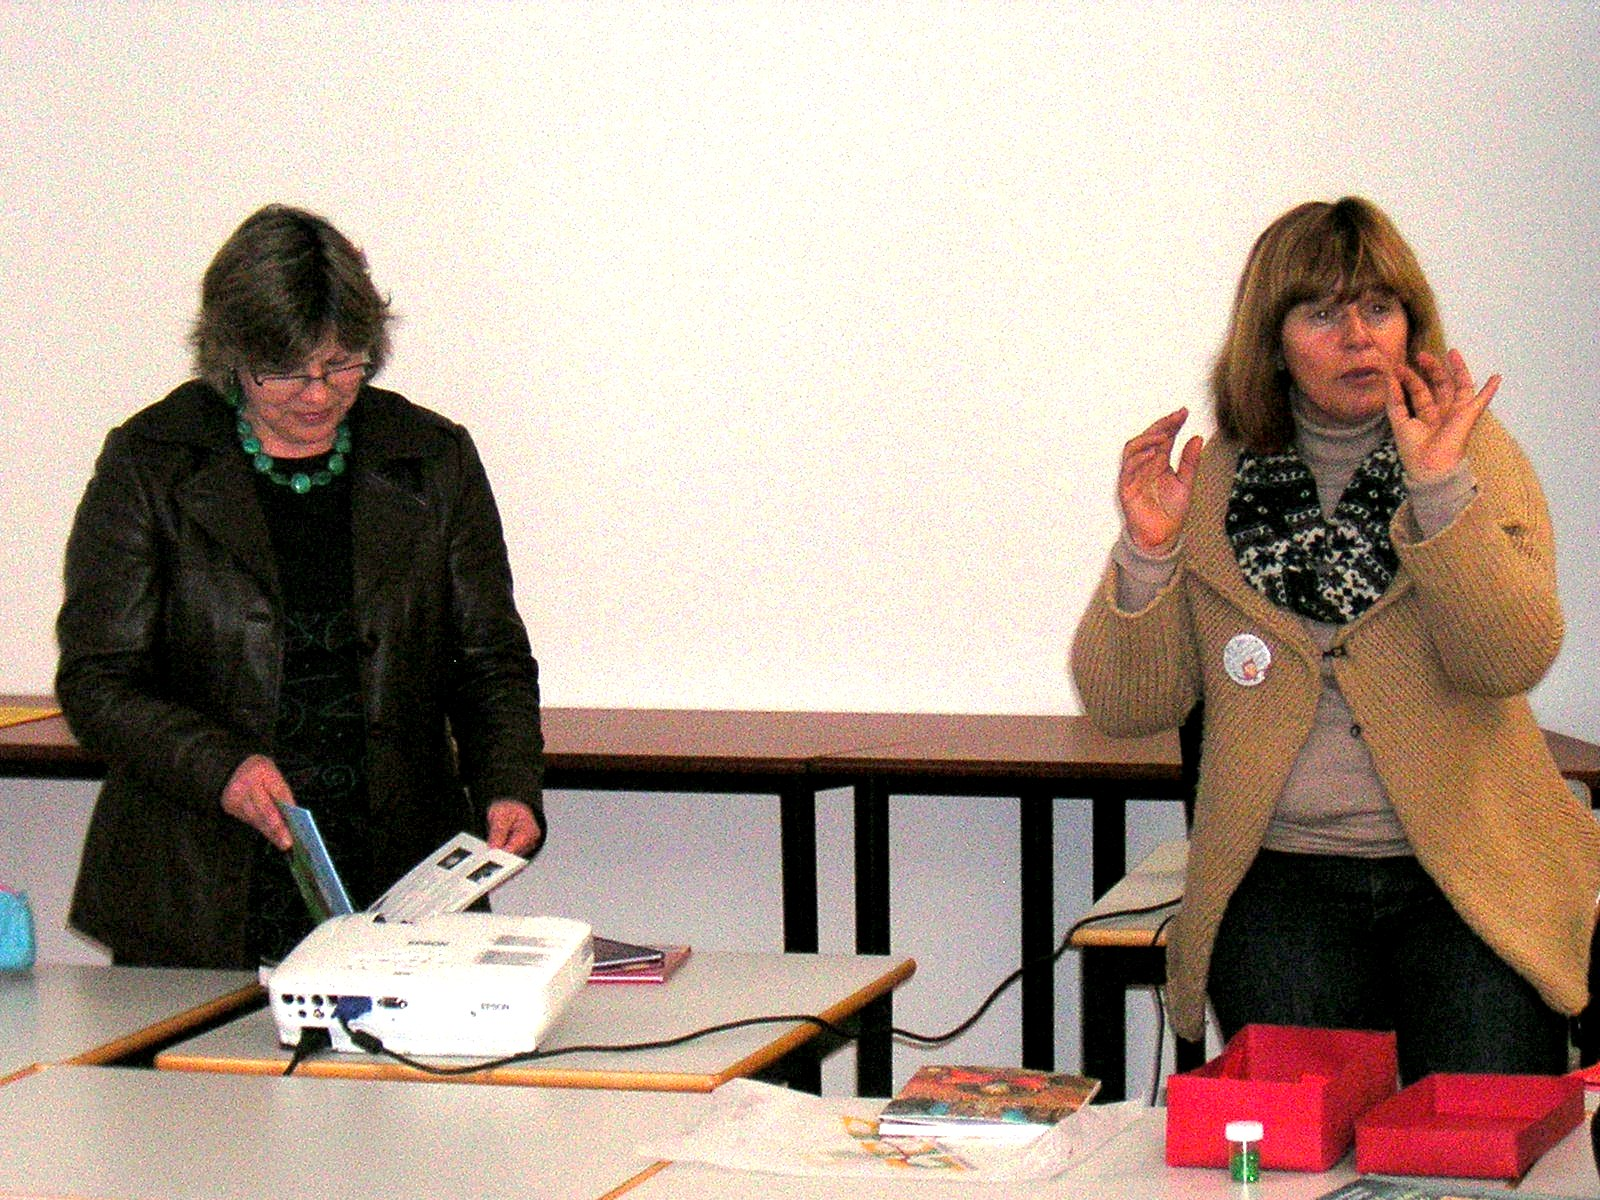 workshop sobre narrativa para crianças - Vanda Furtado 3 jan. 13 004